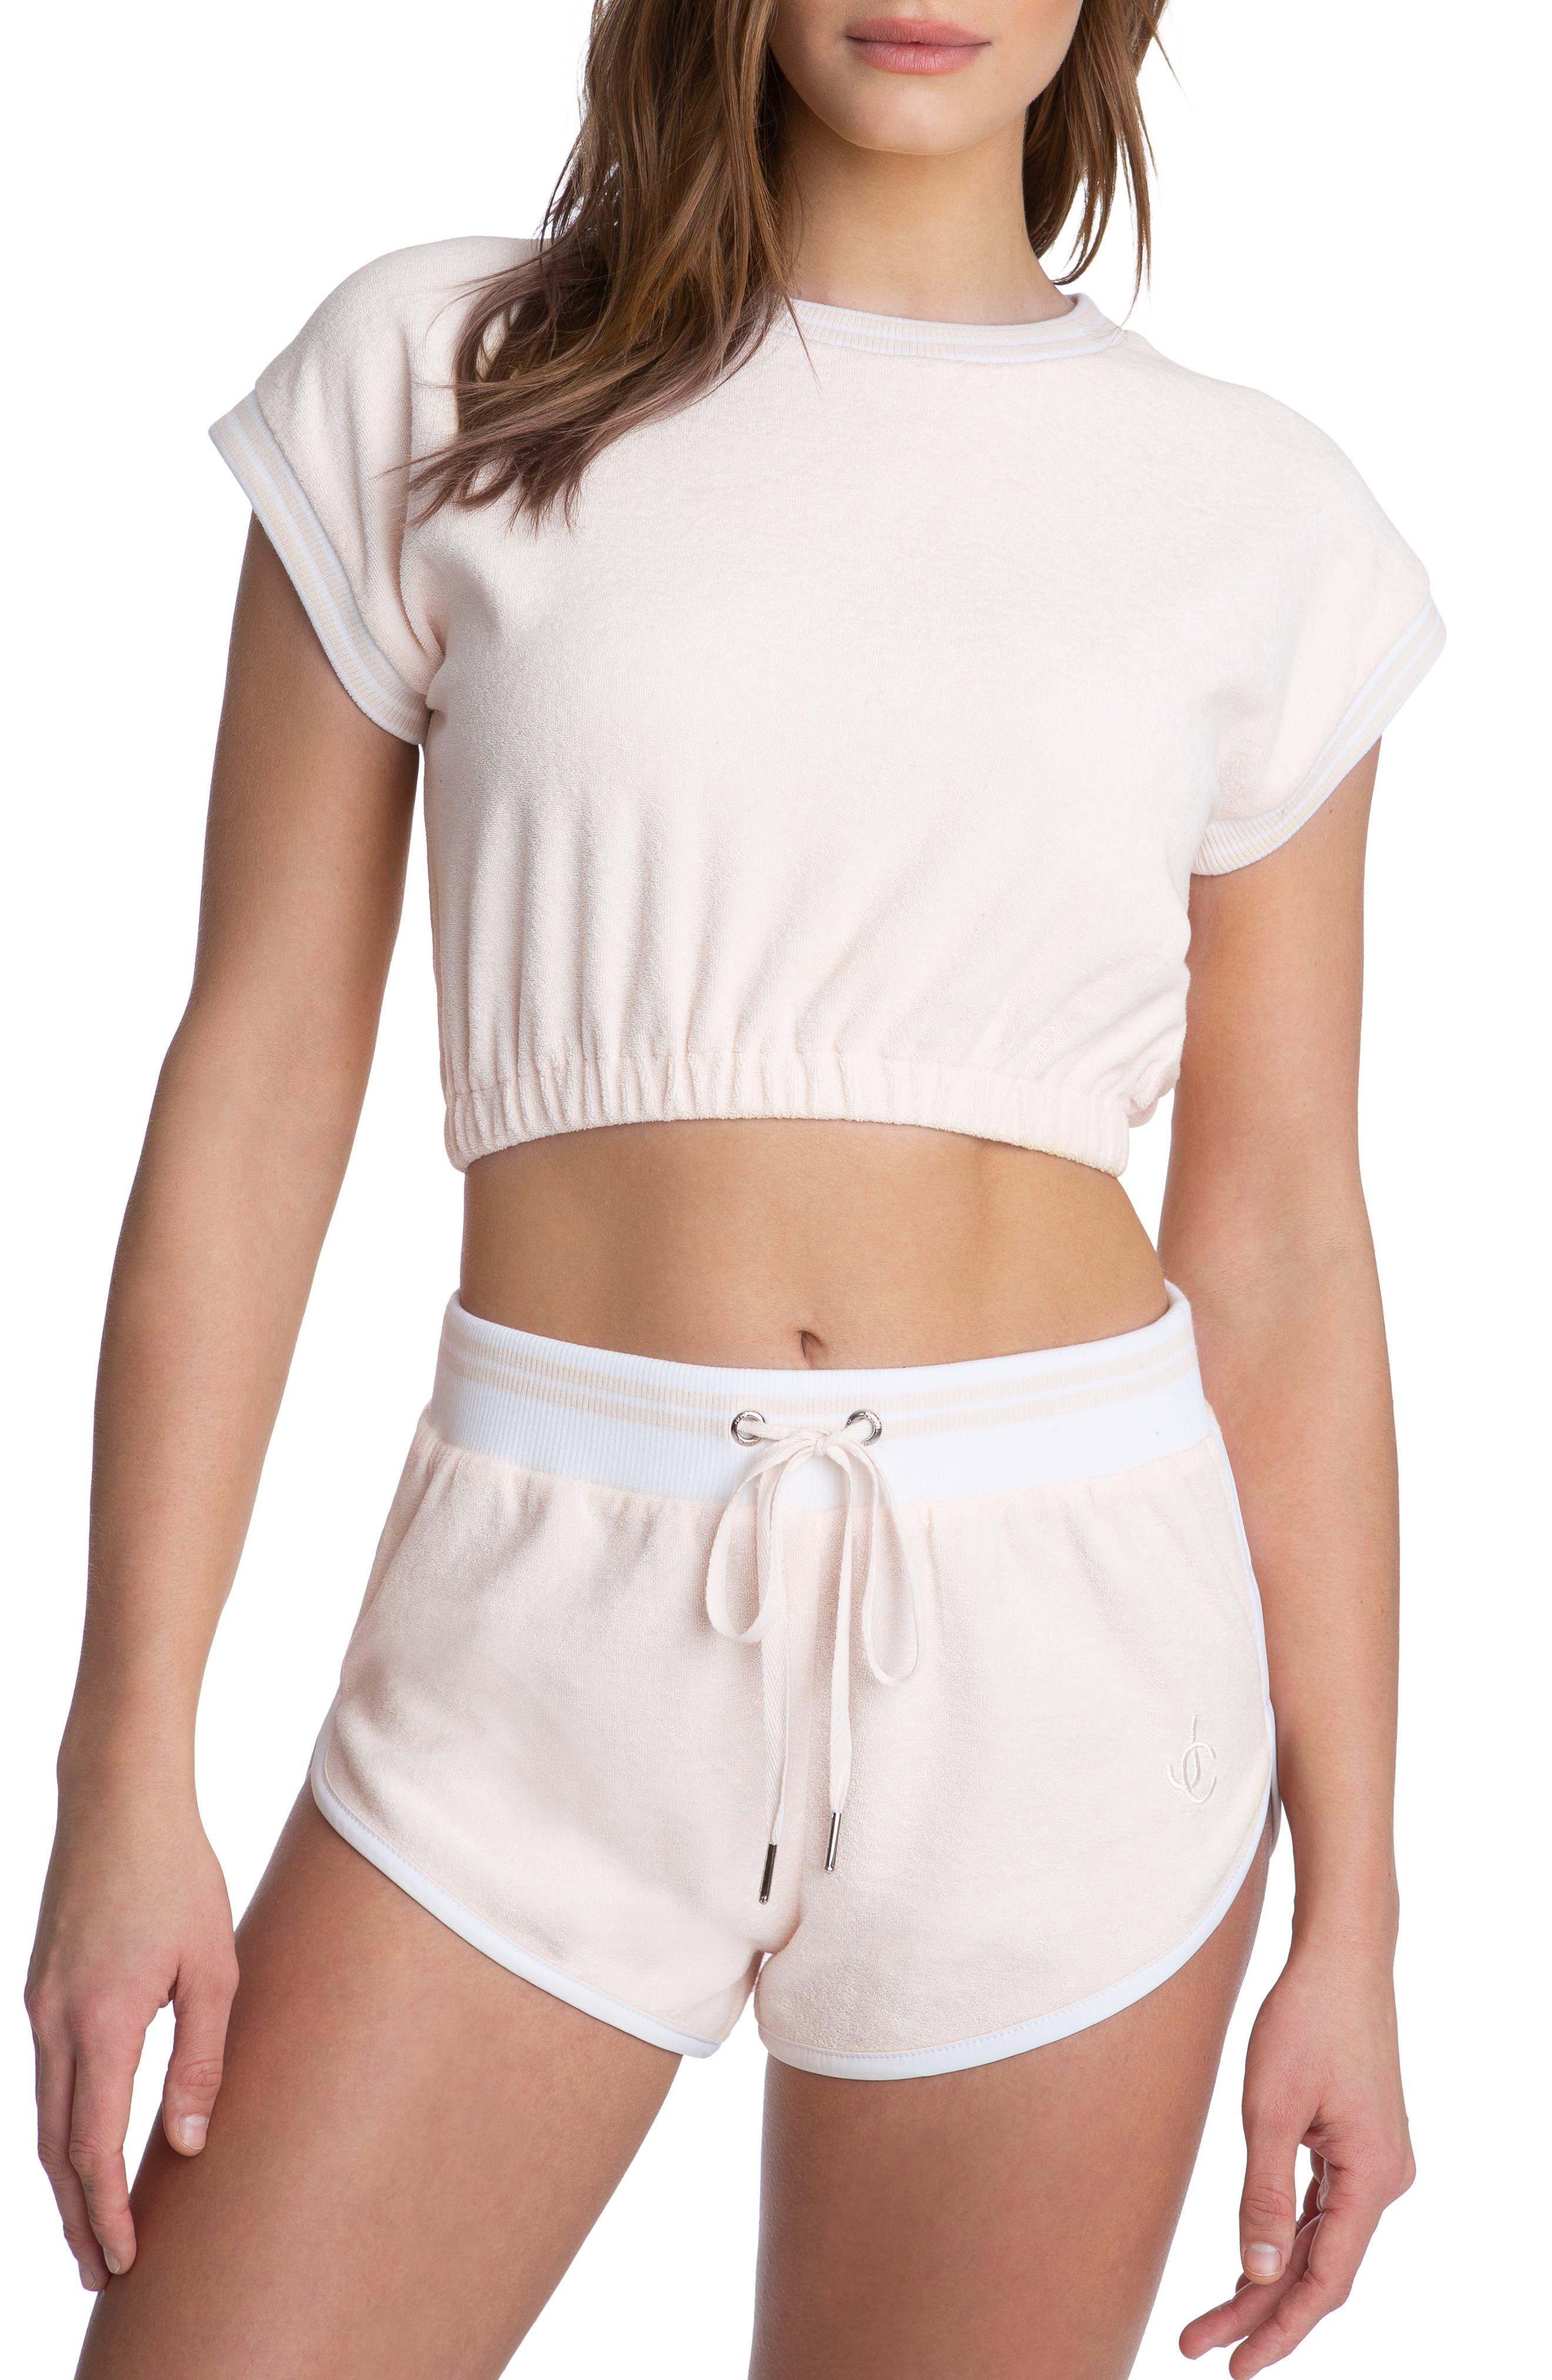 Terry Cloth Crop Top